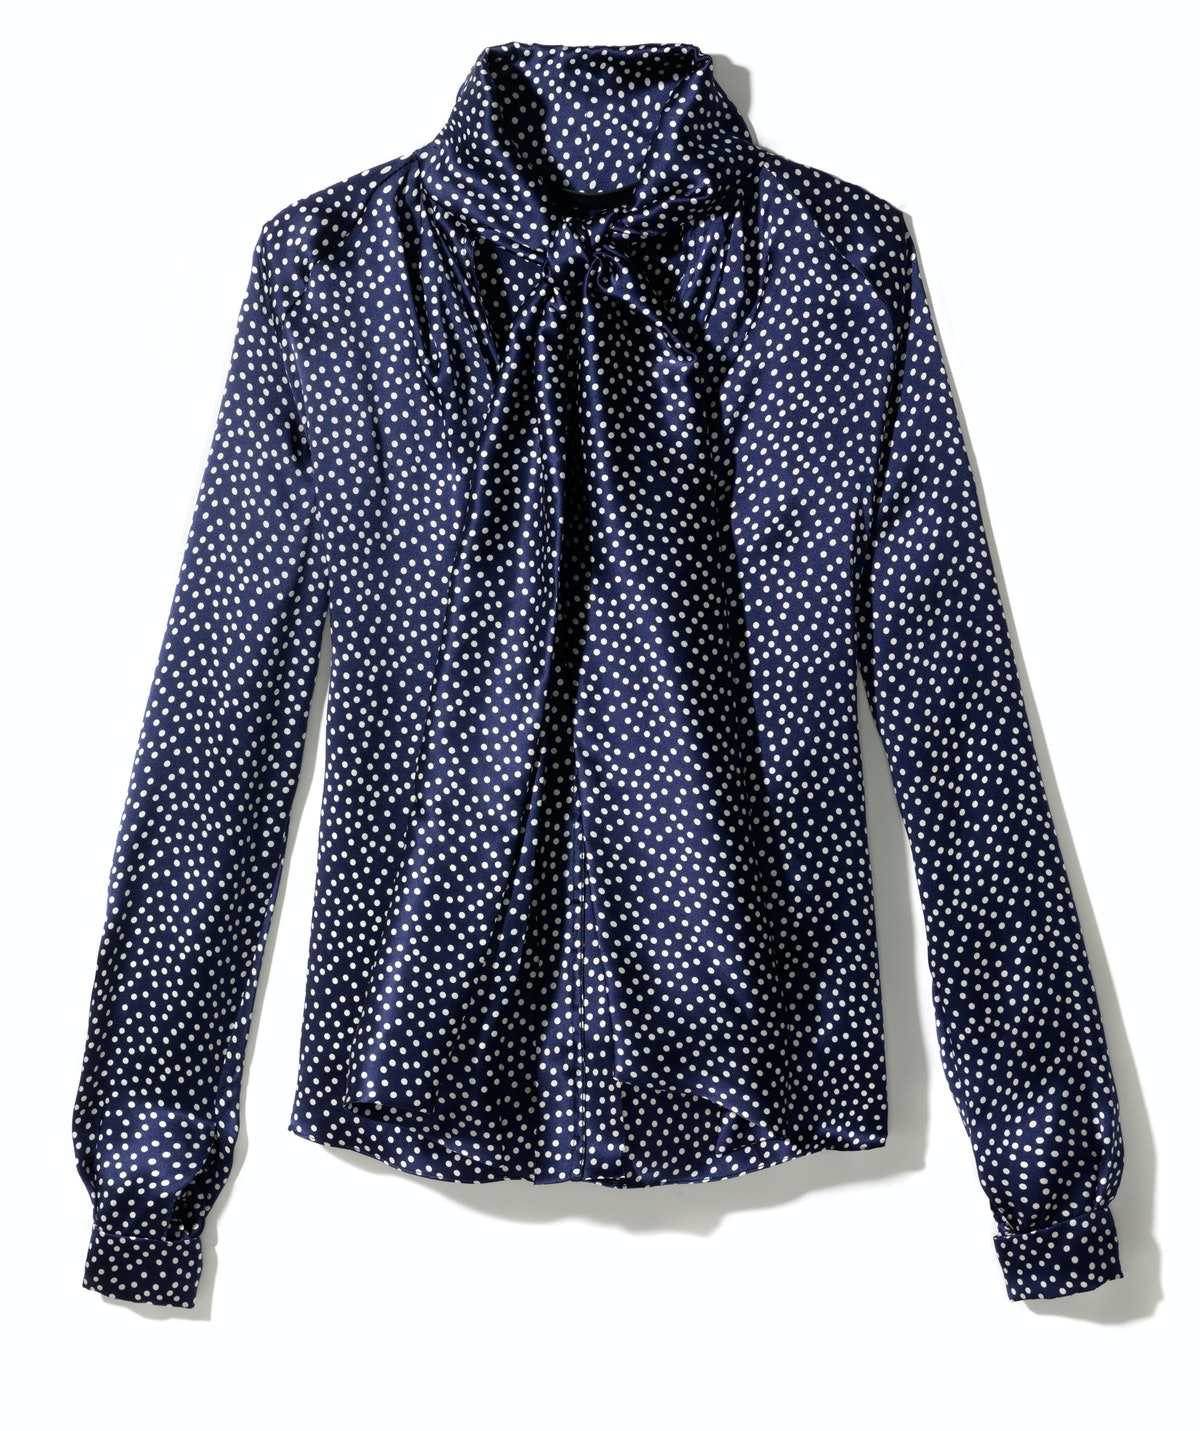 Juan Carlos Obando blouse, $1,150, Barneys New York.